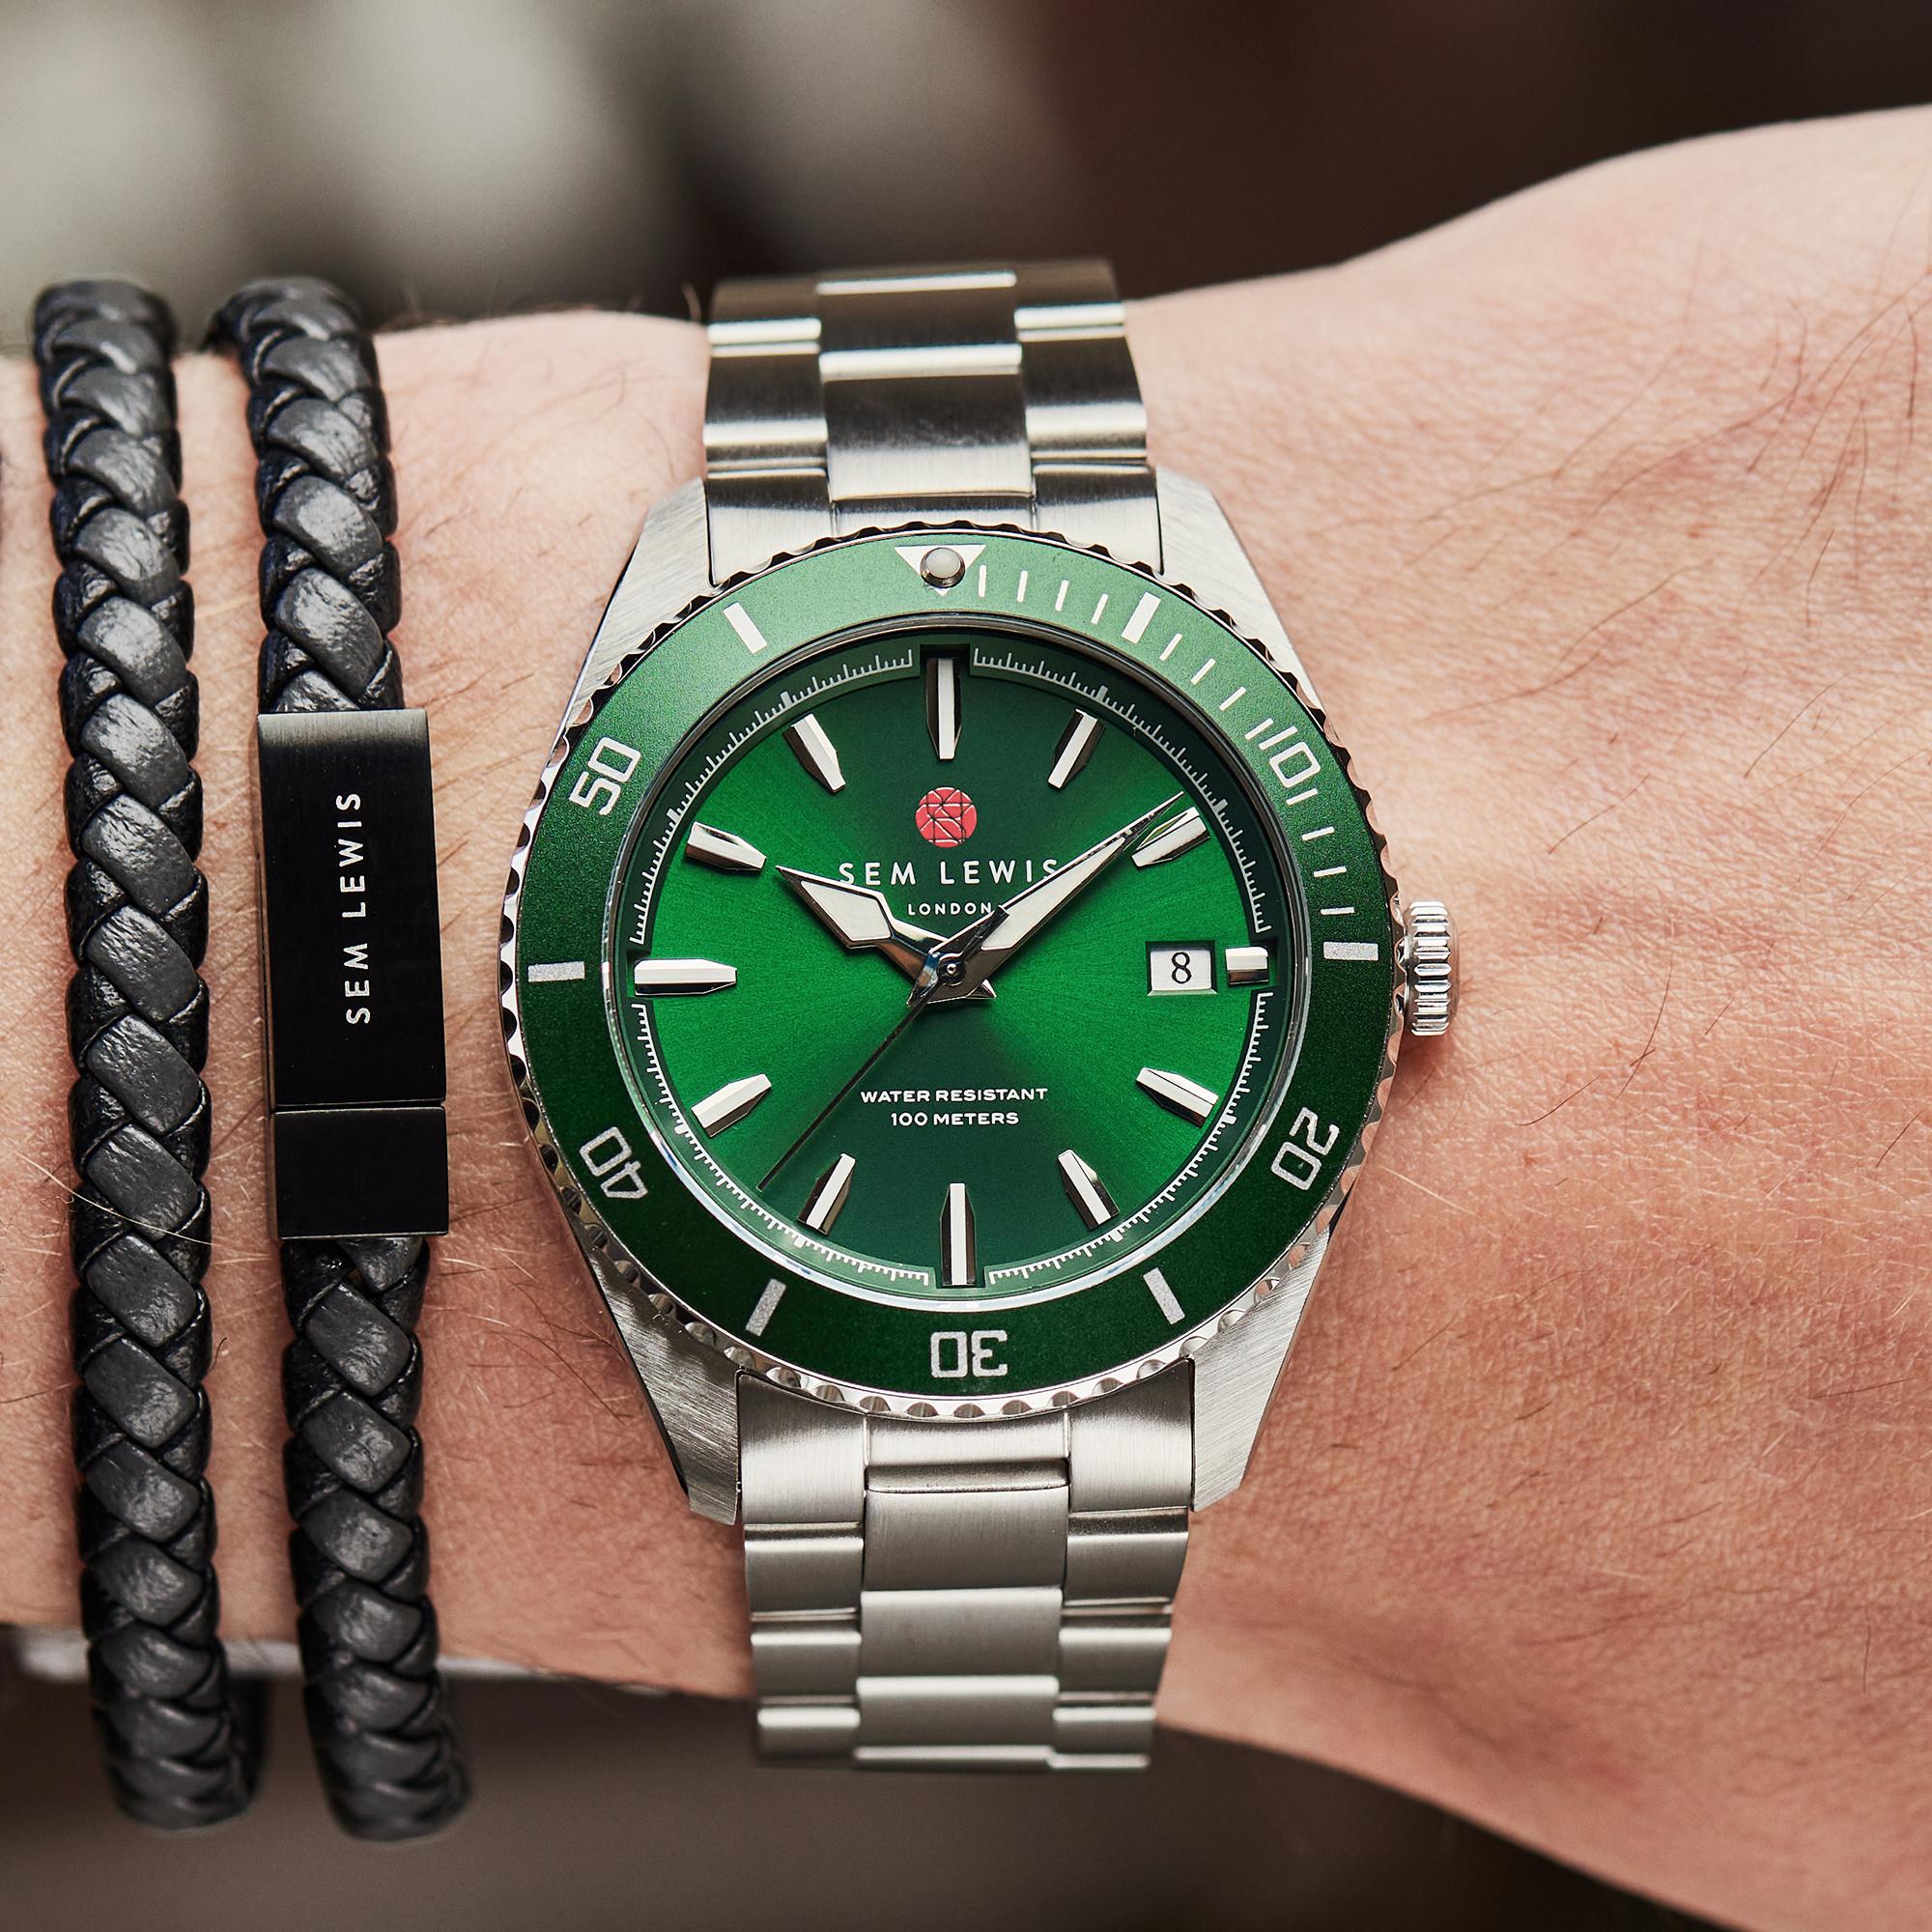 Sem Lewis Lundy Island Diver klocka silverfärgad och grön